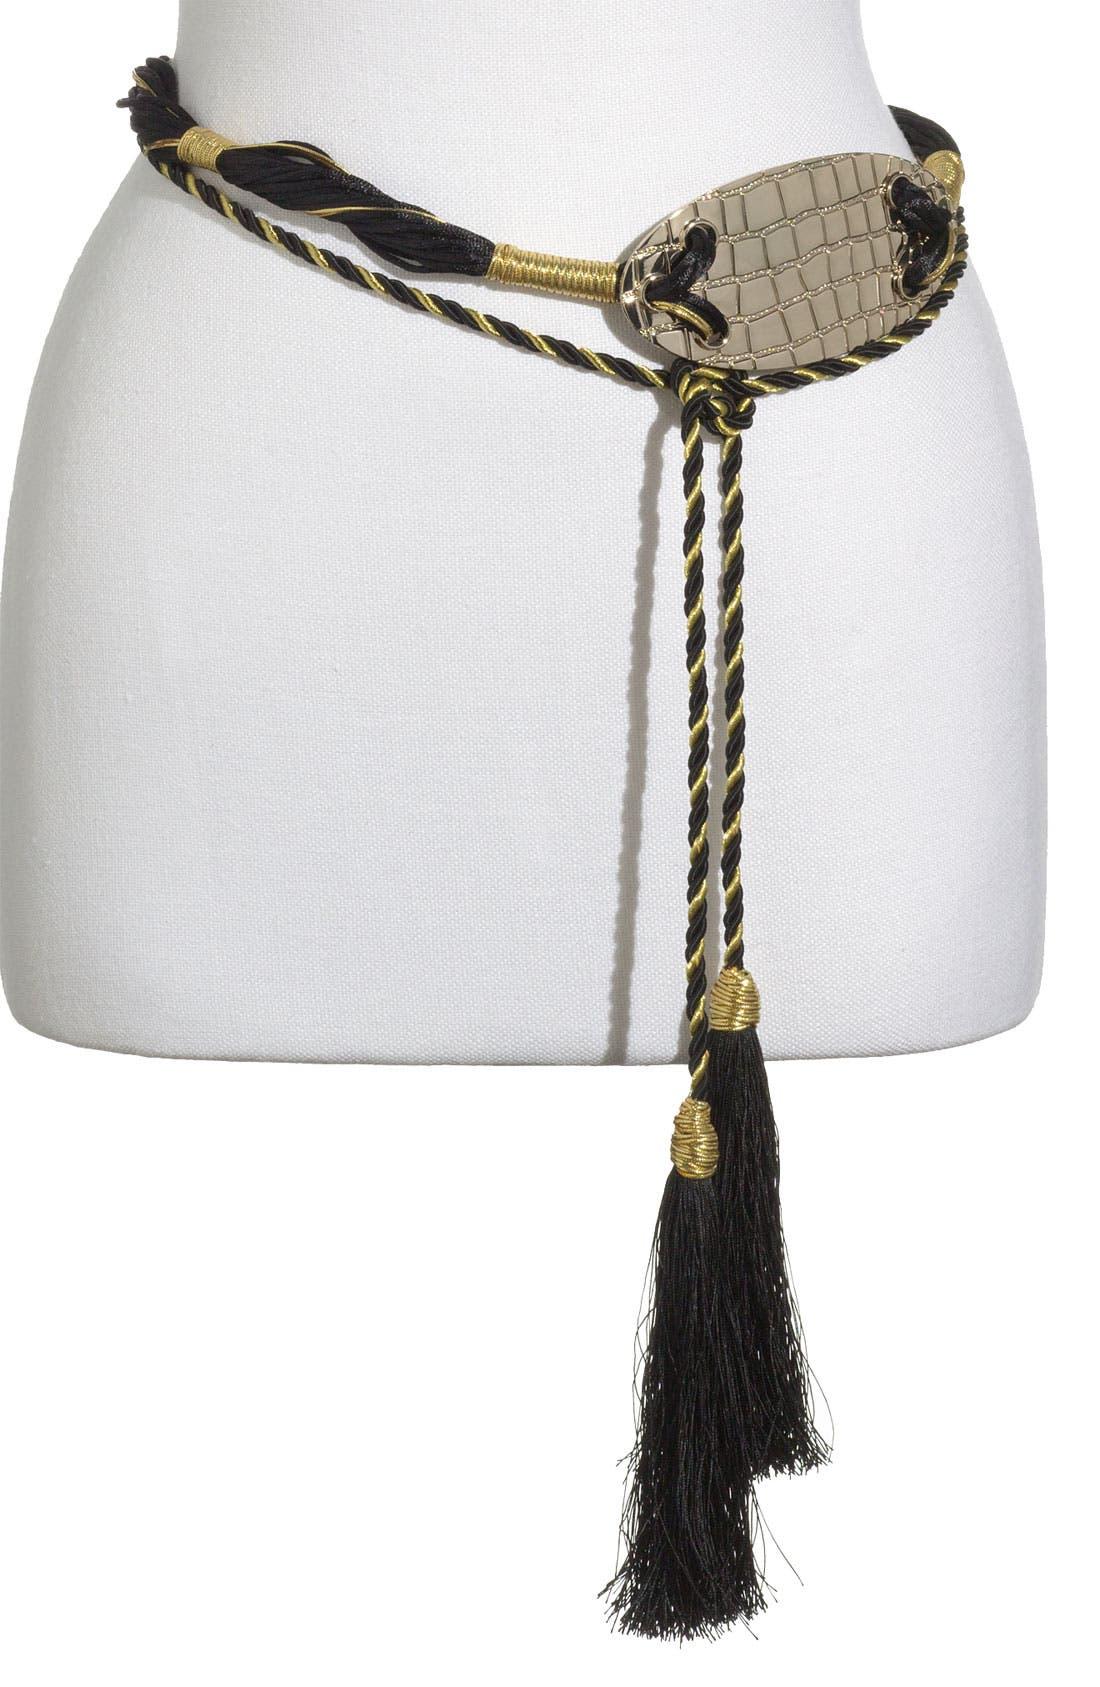 Alternate Image 1 Selected - Raina 'The Croco' Rope Belt